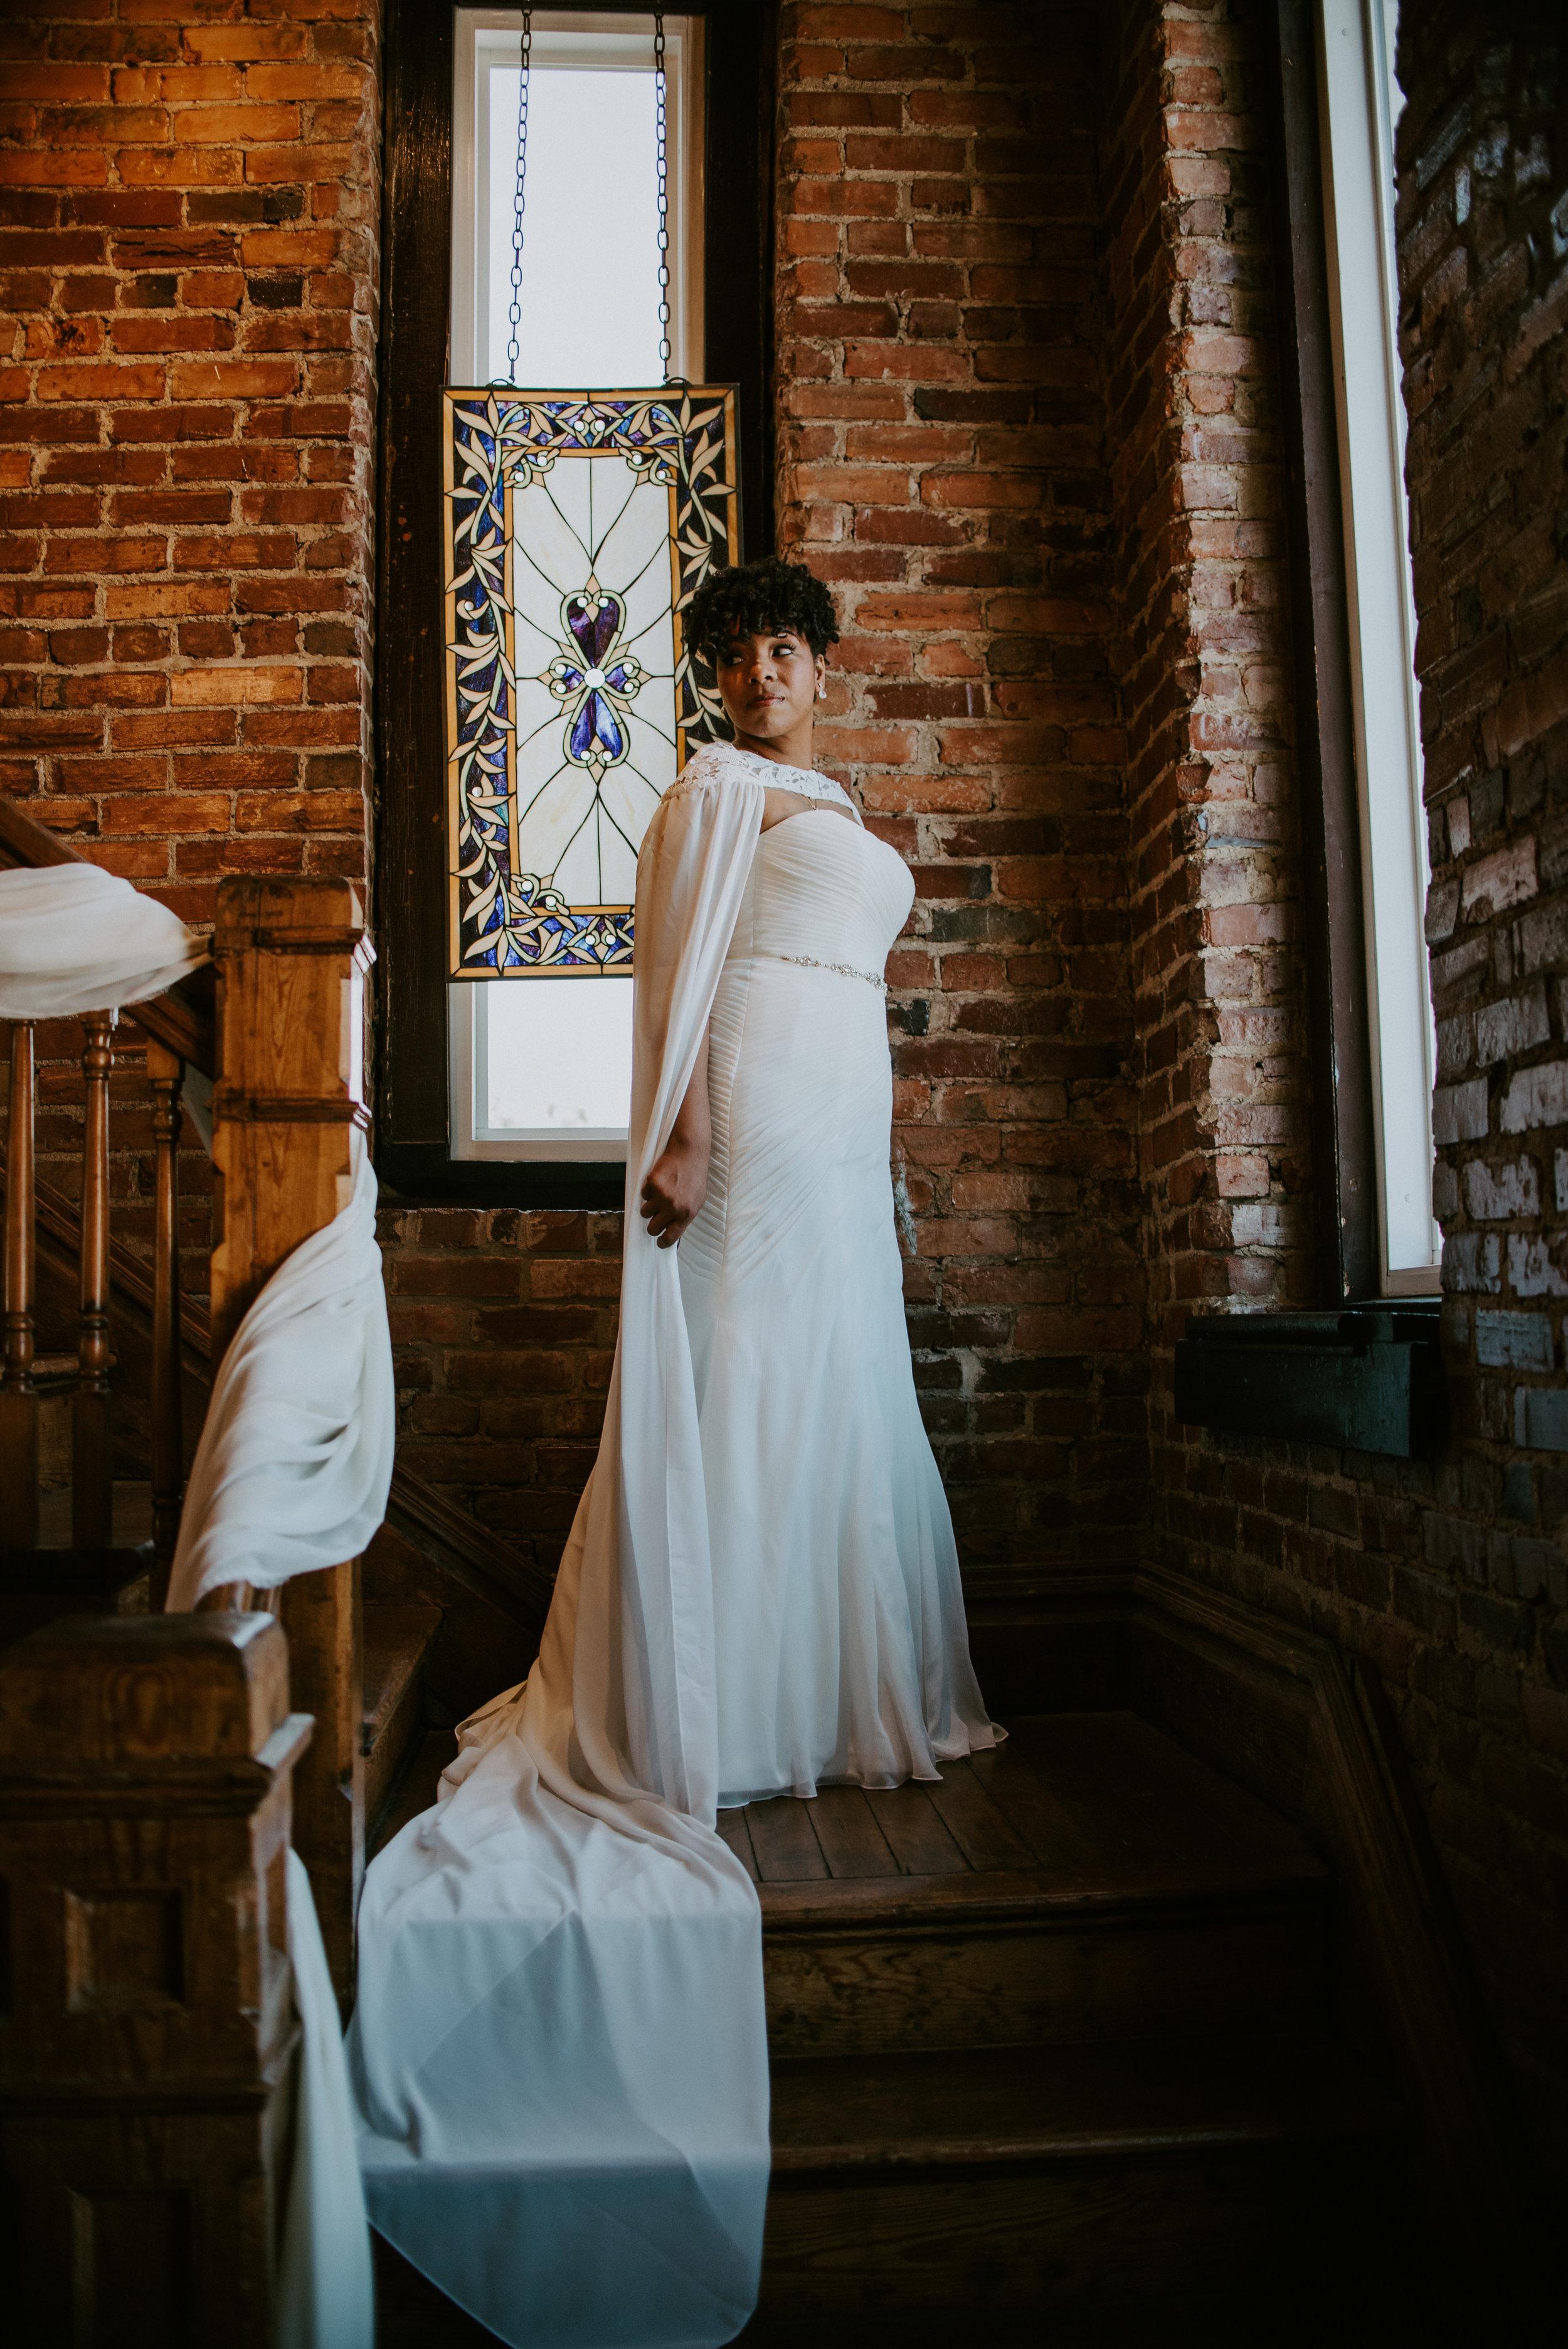 WonderlyCreative_Wedding_6.7.18_Khara&Dwayne_-206.jpg